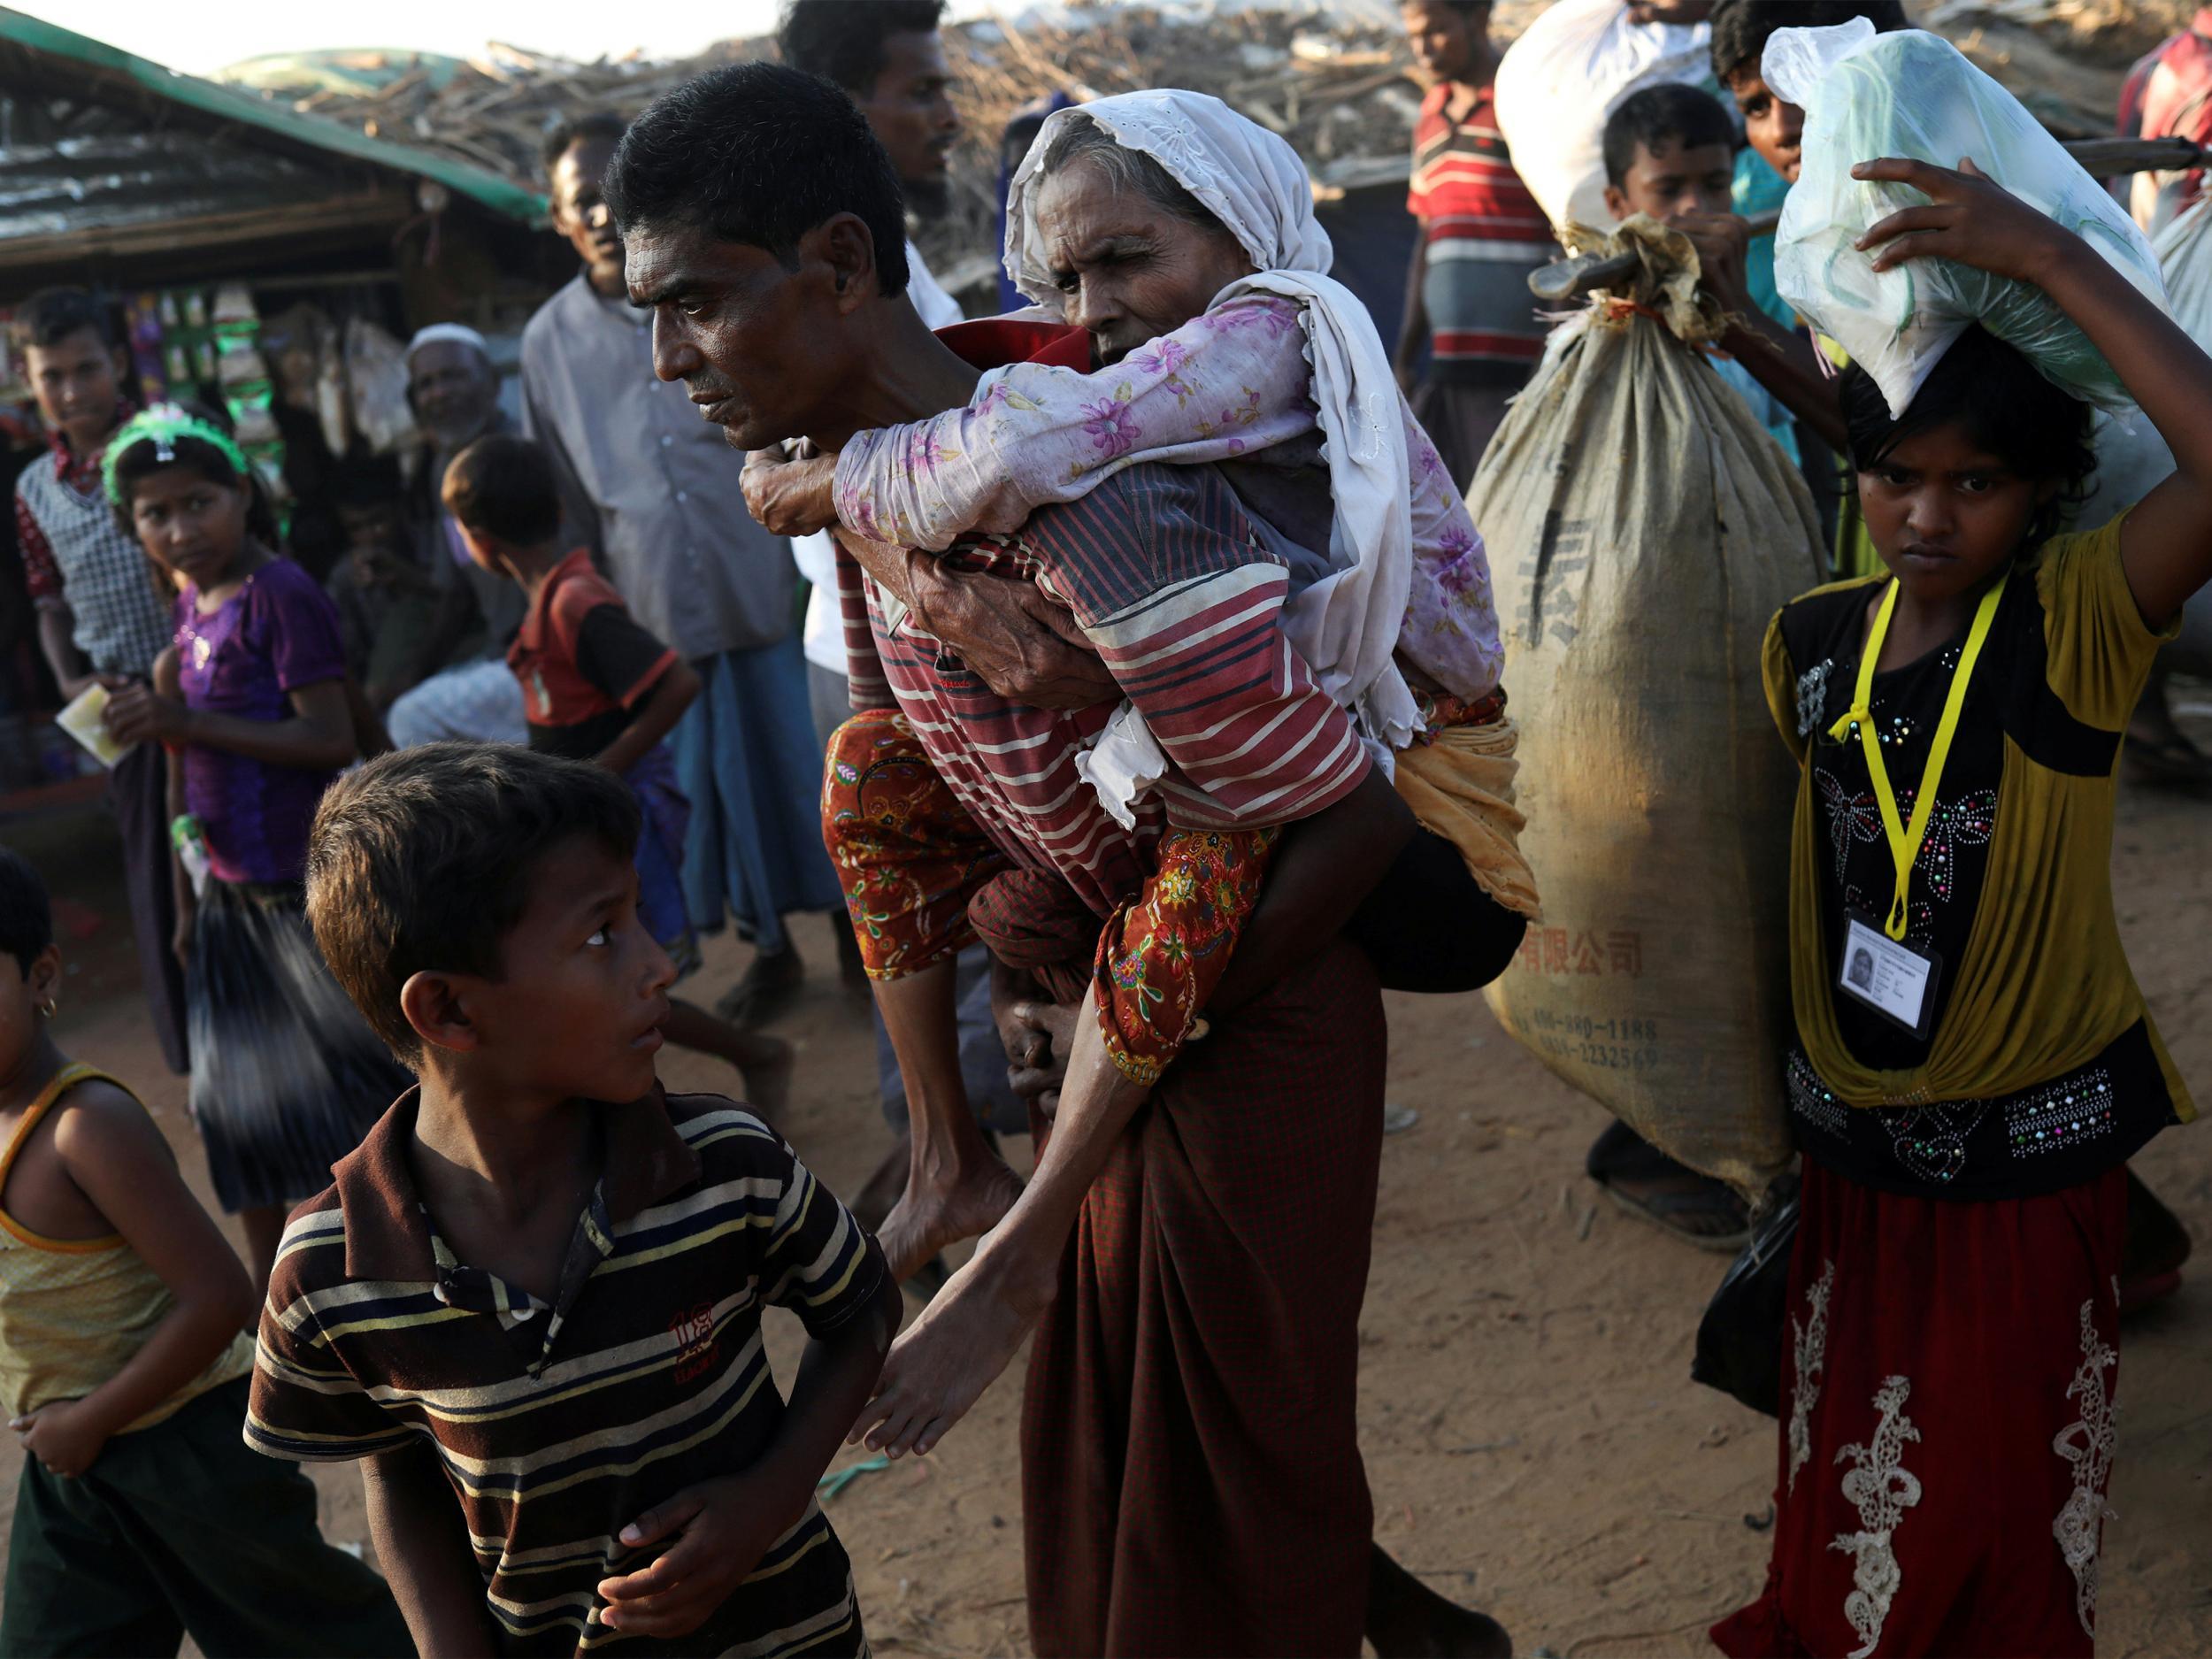 Burma and Bangladesh agree deal to repatriate Rohingya Muslims